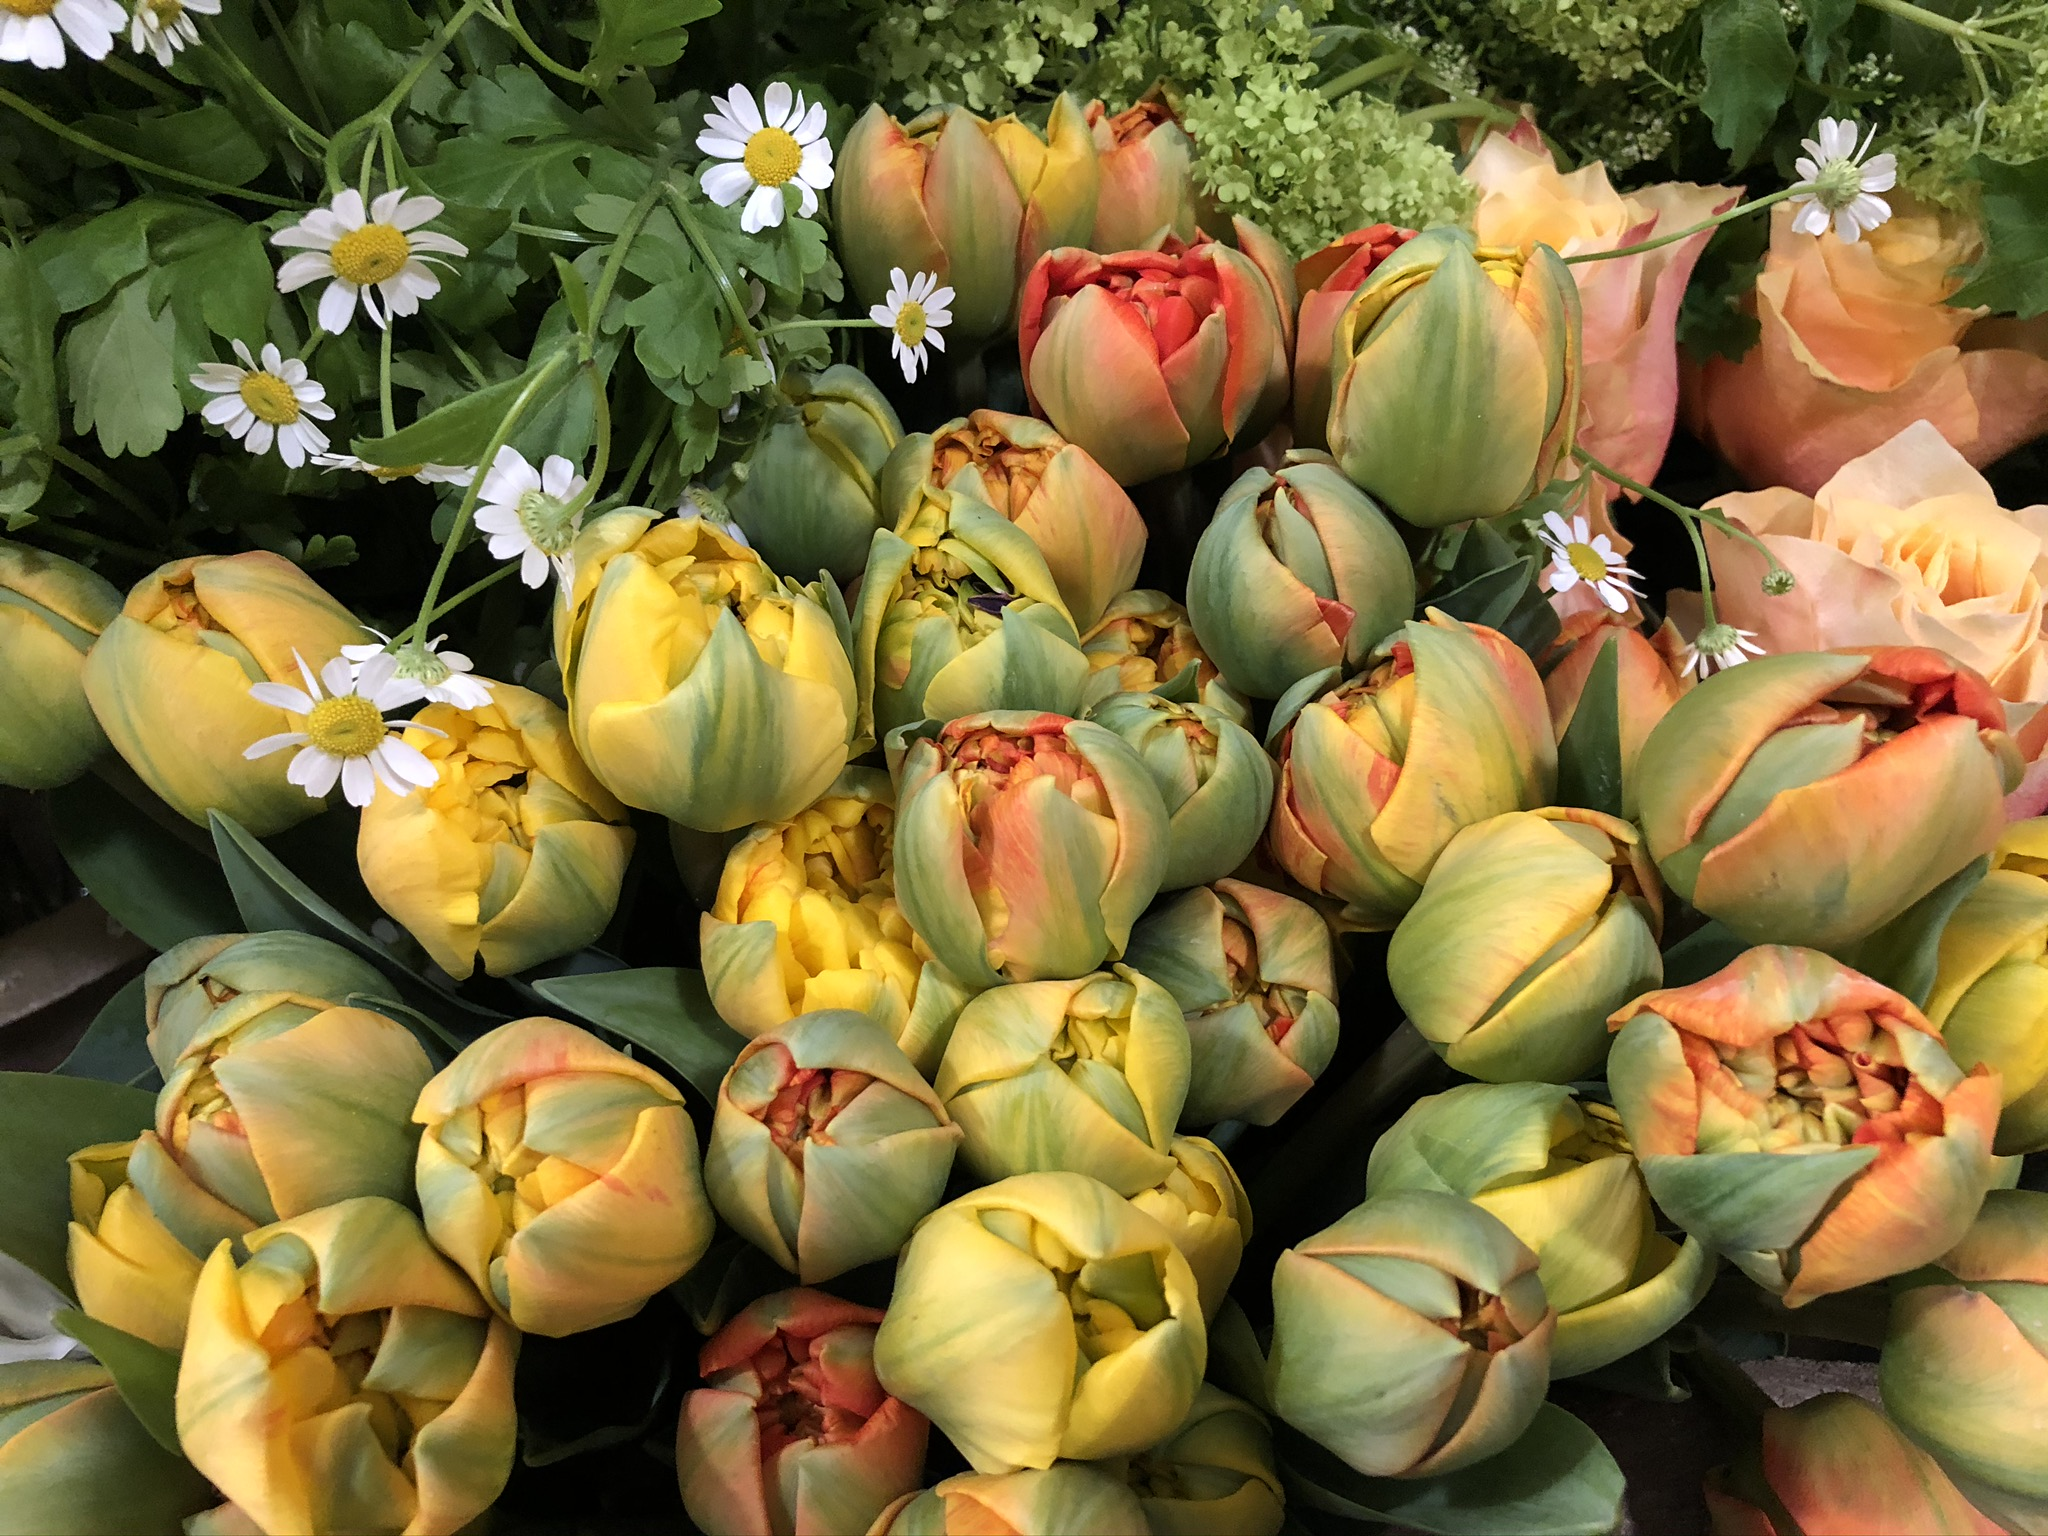 Tulipes Marlies Fleurs fleuriste Nimes